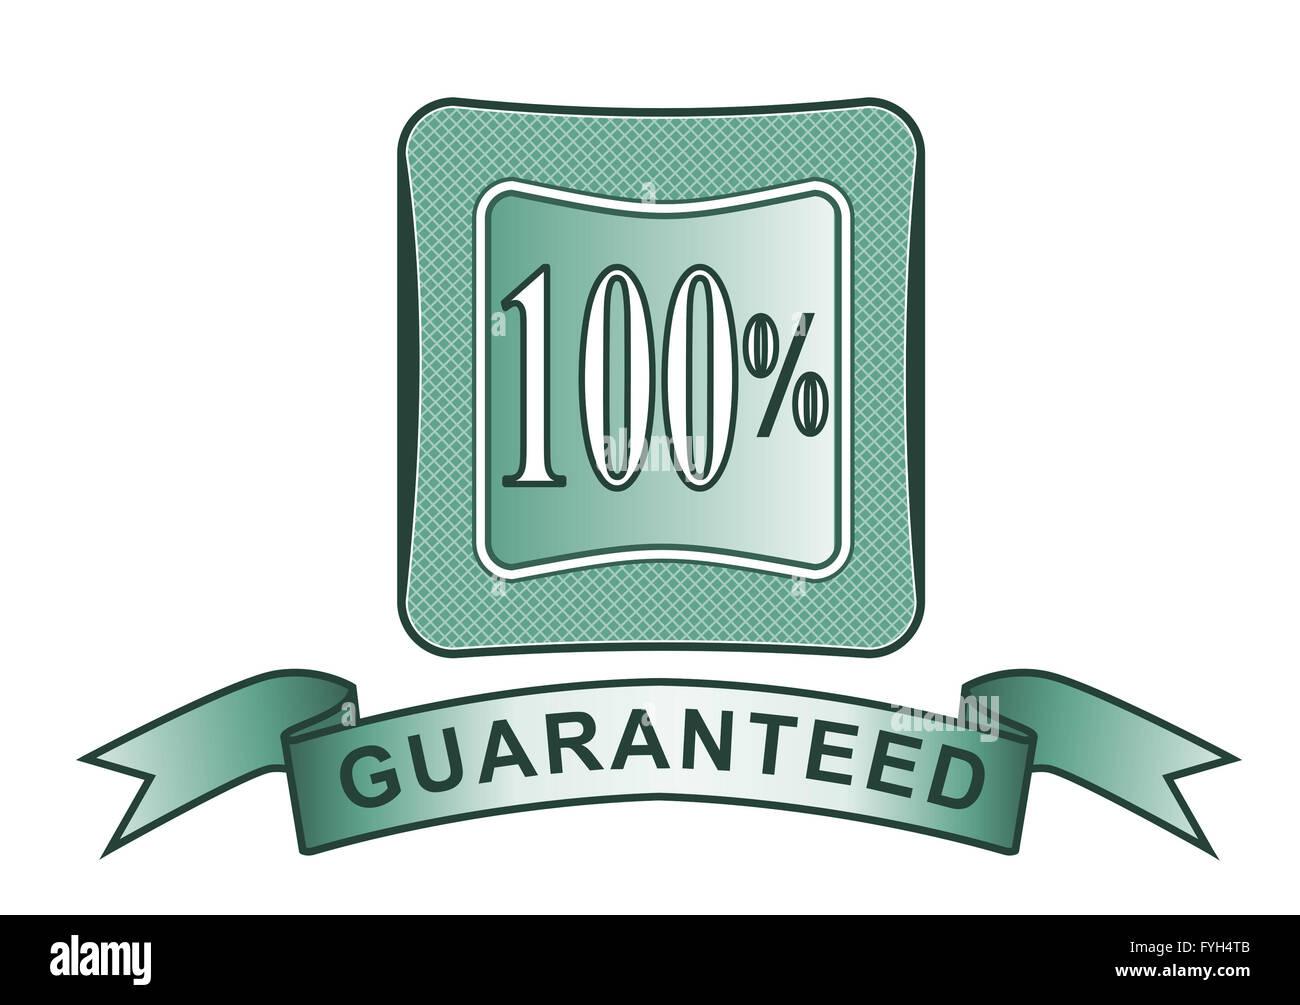 100% Satisfaction Guaranteed in Shield - Stock Image